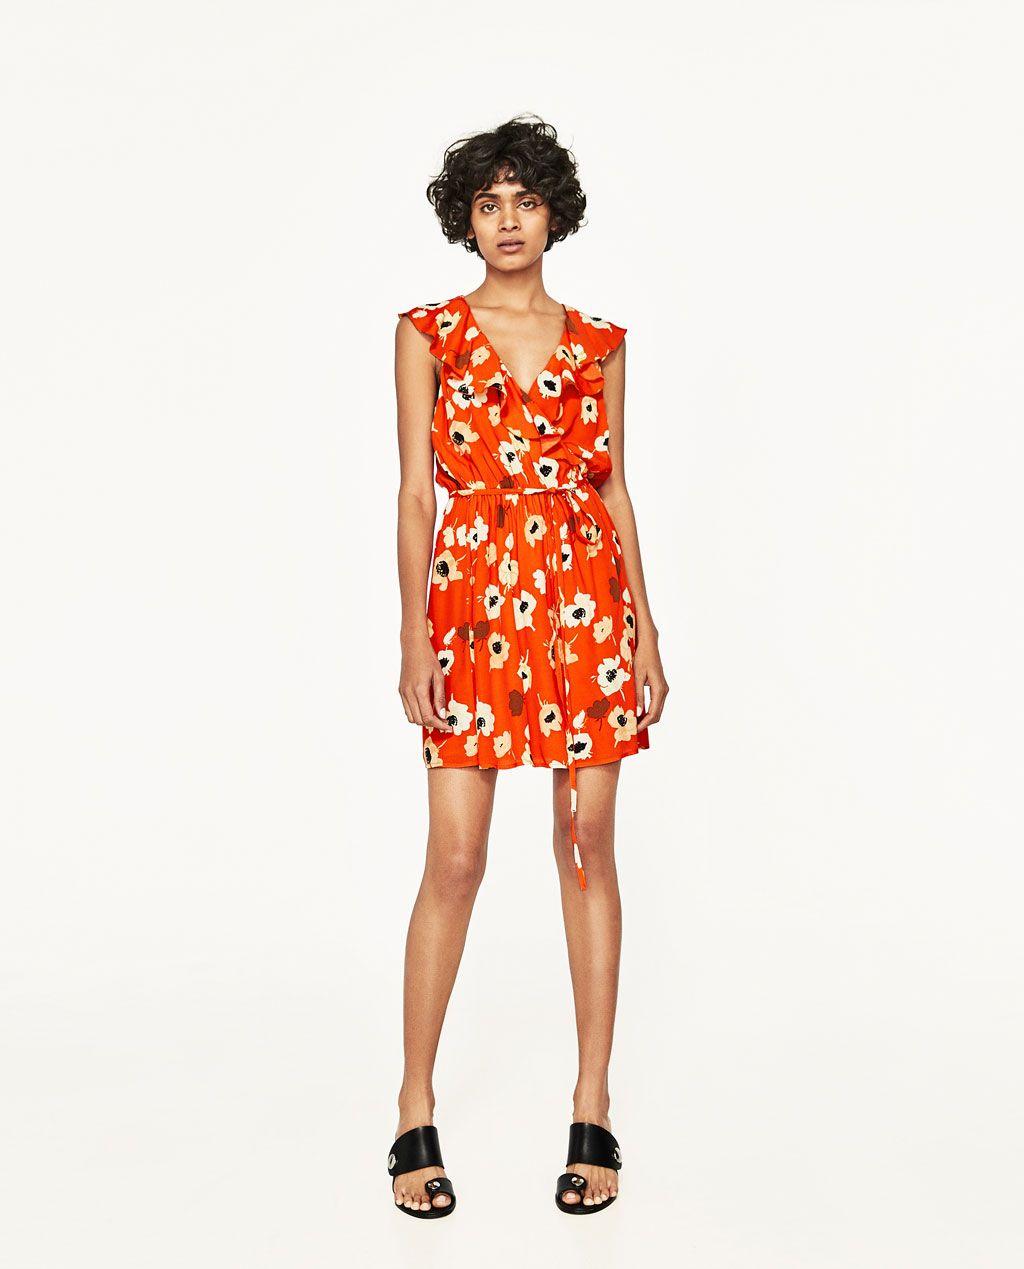 2ebc89cb9825 ZARA - WOMAN - FLORAL PRINT CROSSOVER DRESS